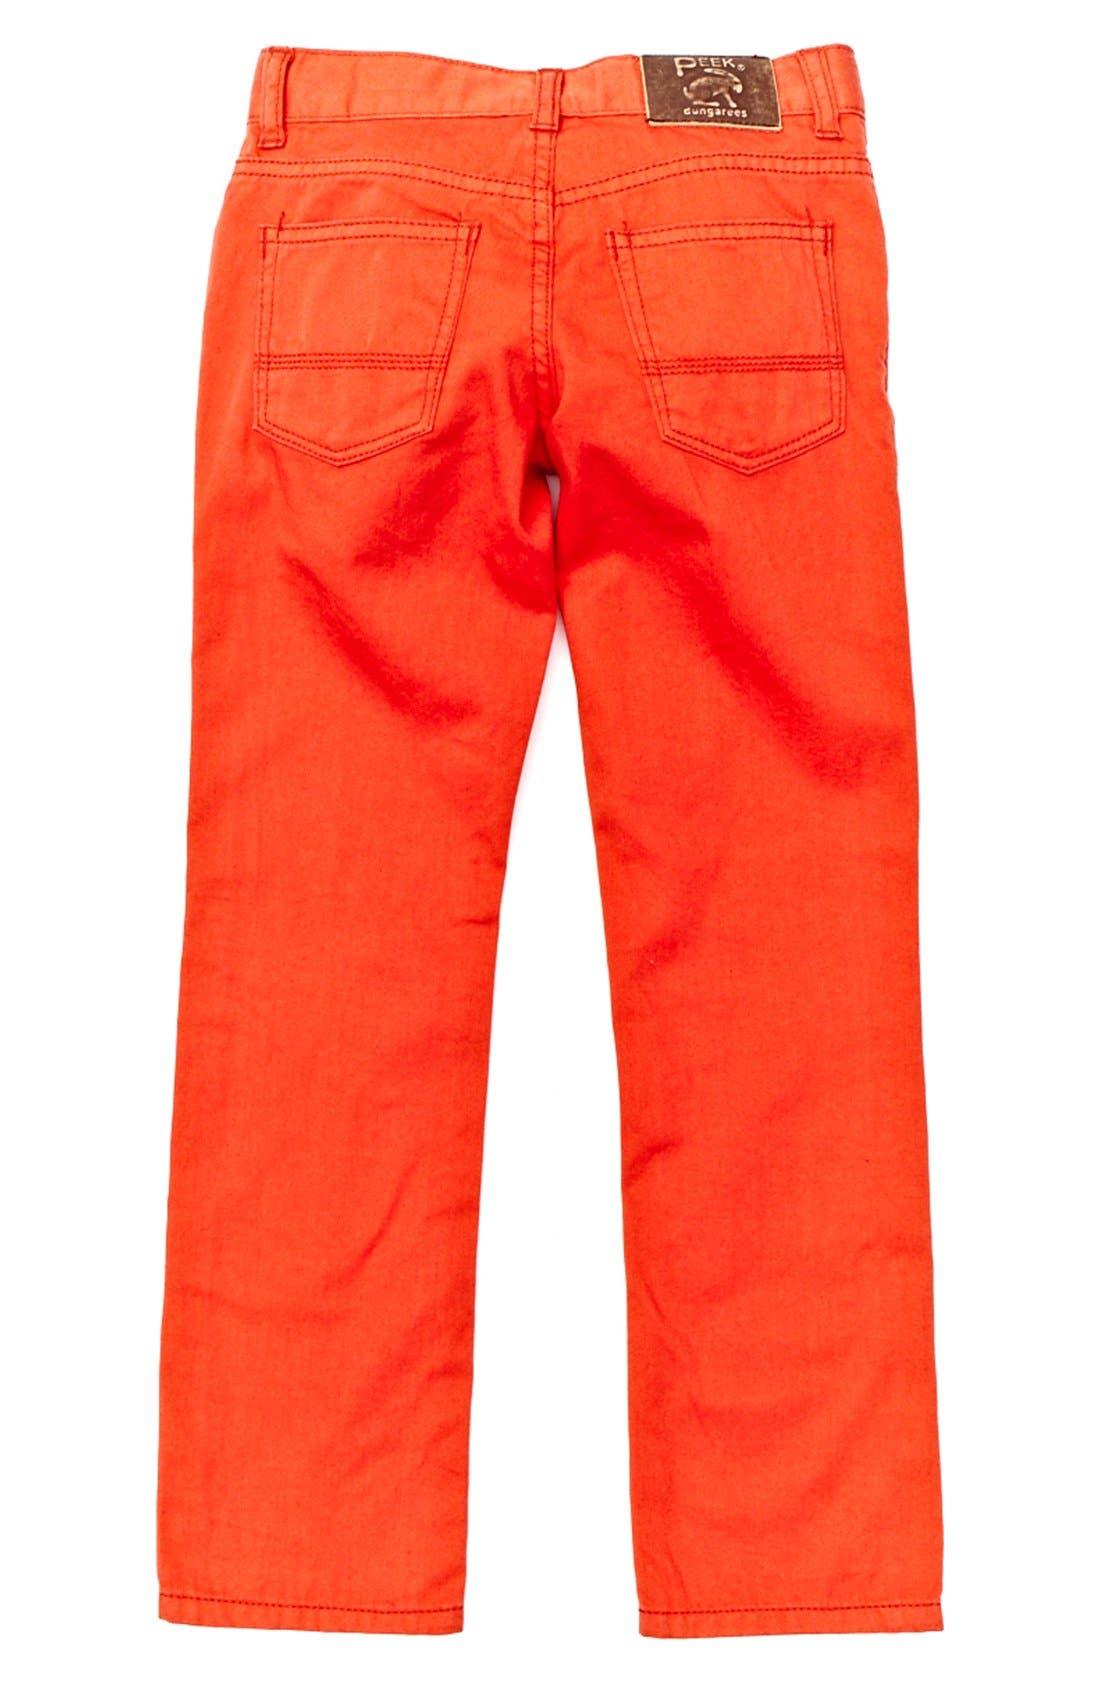 Alternate Image 2  - Peek 'Slouch' Twill Jeans (Toddler Boys, Little Boys & Big Boys)